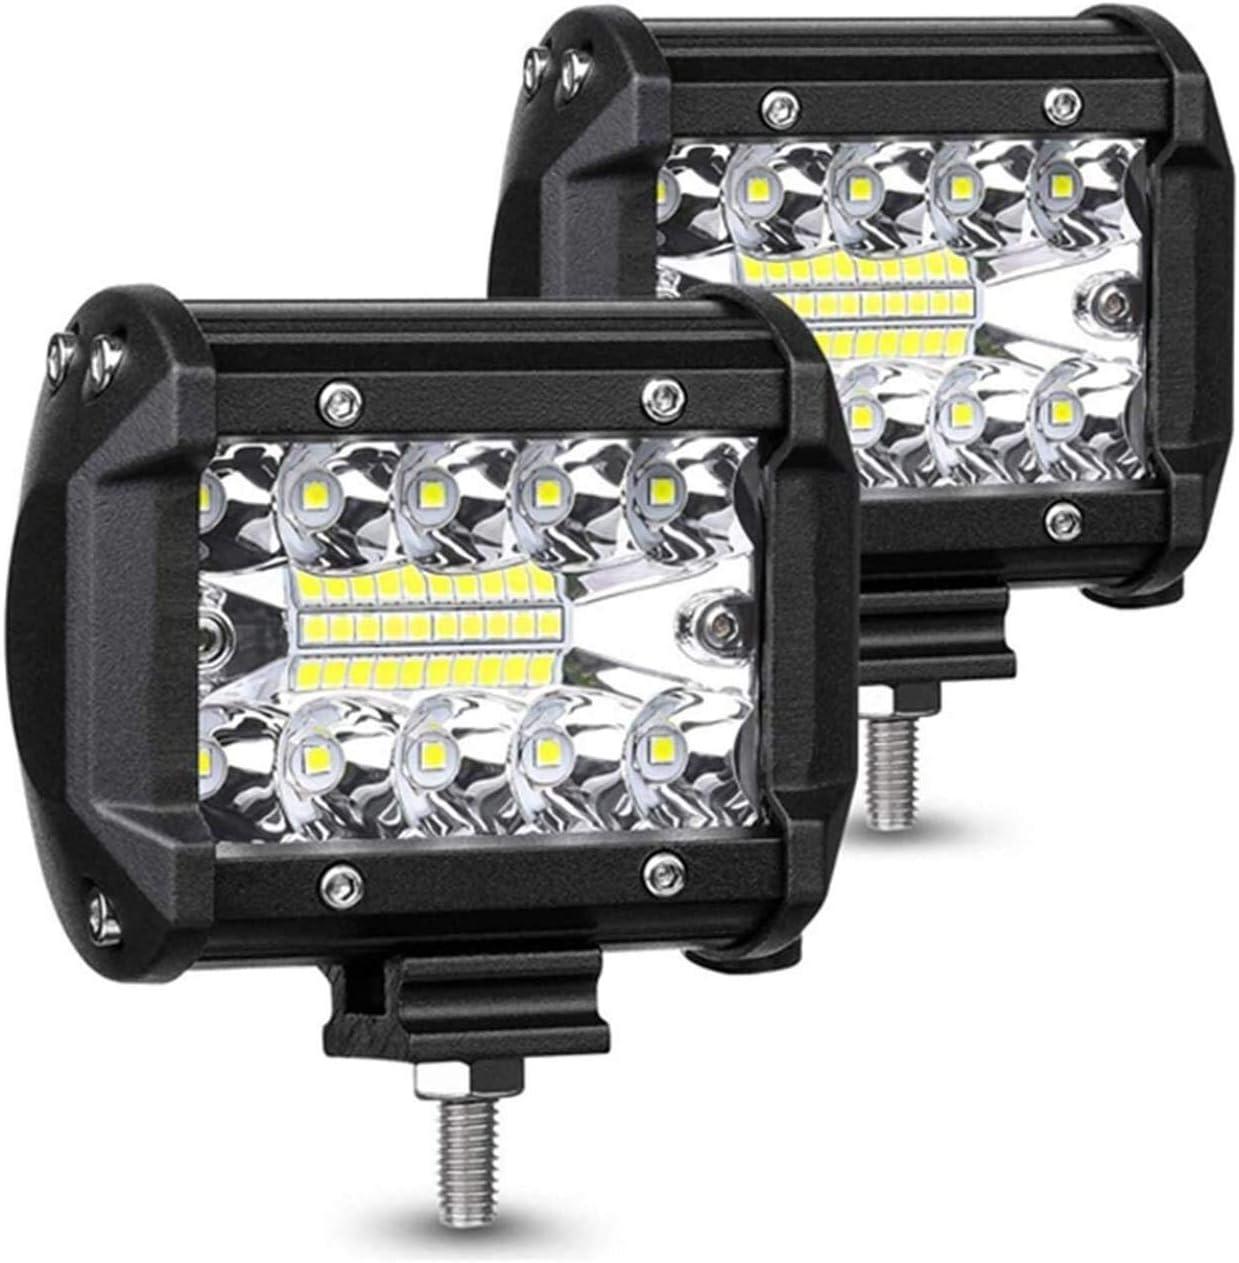 LED Pods Light Ranking TOP15 Bar 4-Inch Large discharge sale 60-watt 6000-lumen Off Driving Fog Roa